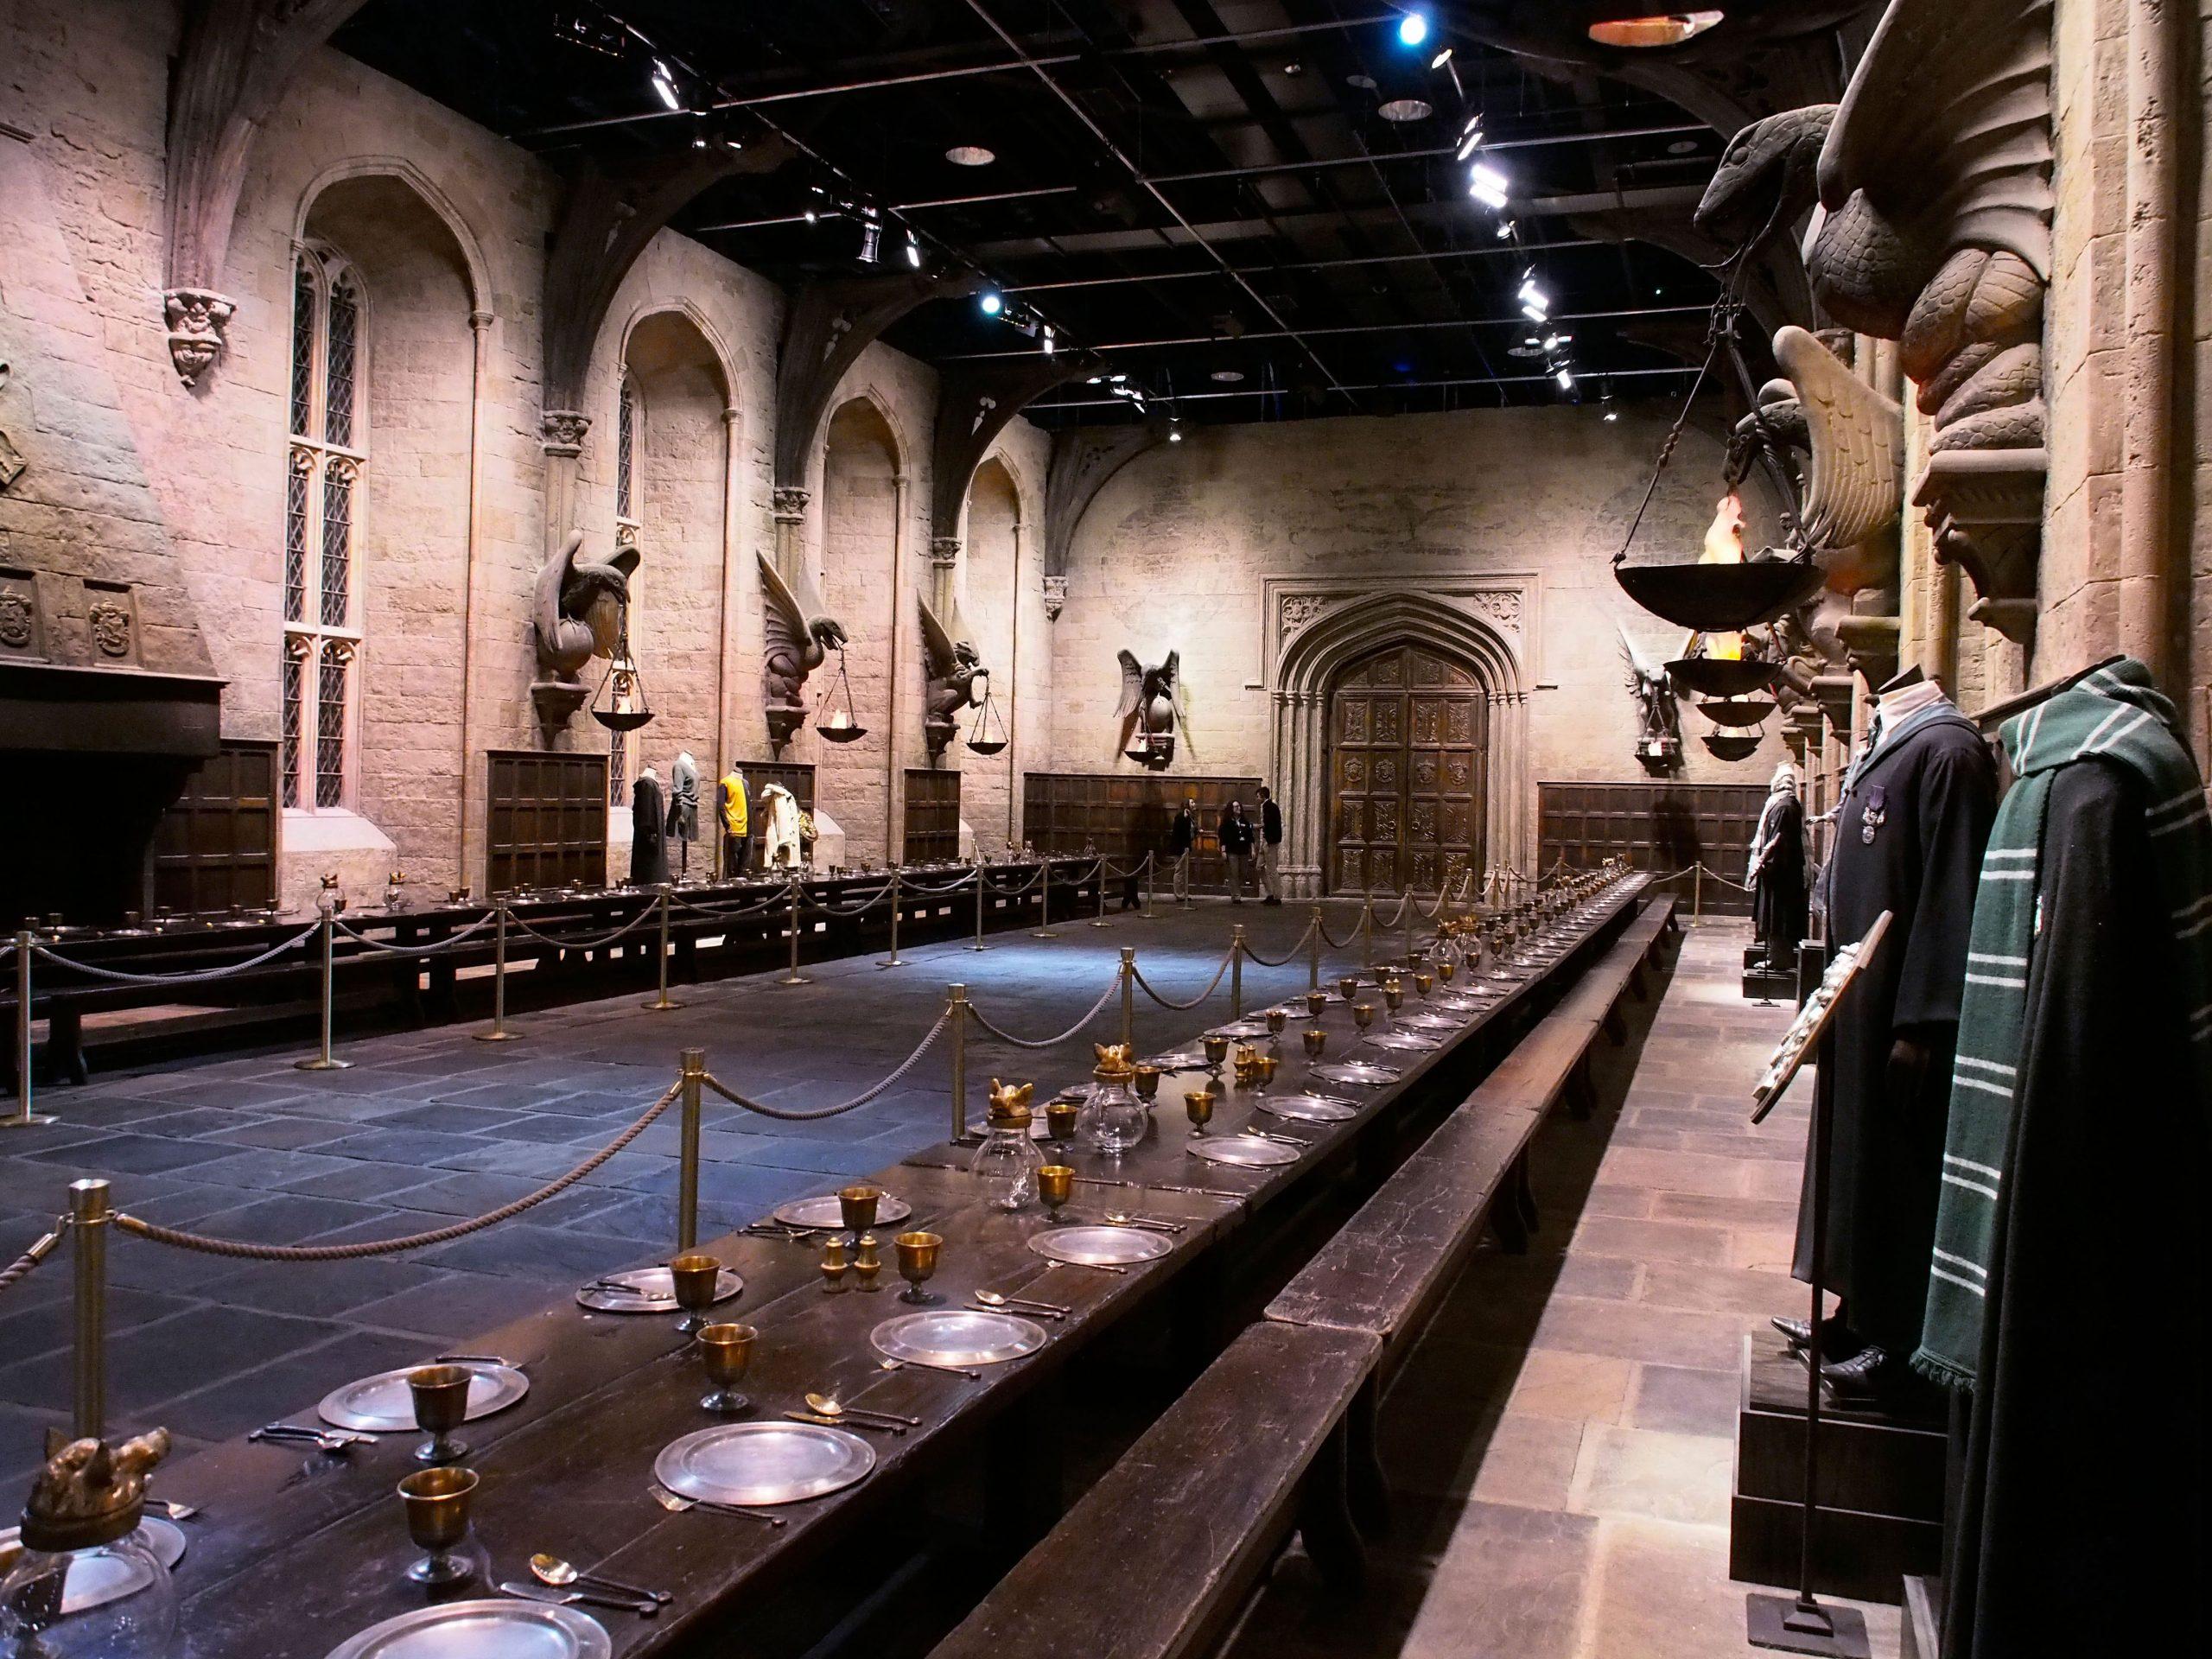 A Harry Potter Tour Of The Uk - Photos - Condé Nast Traveler dedans Studio Warner Bros Londres Harry Potter